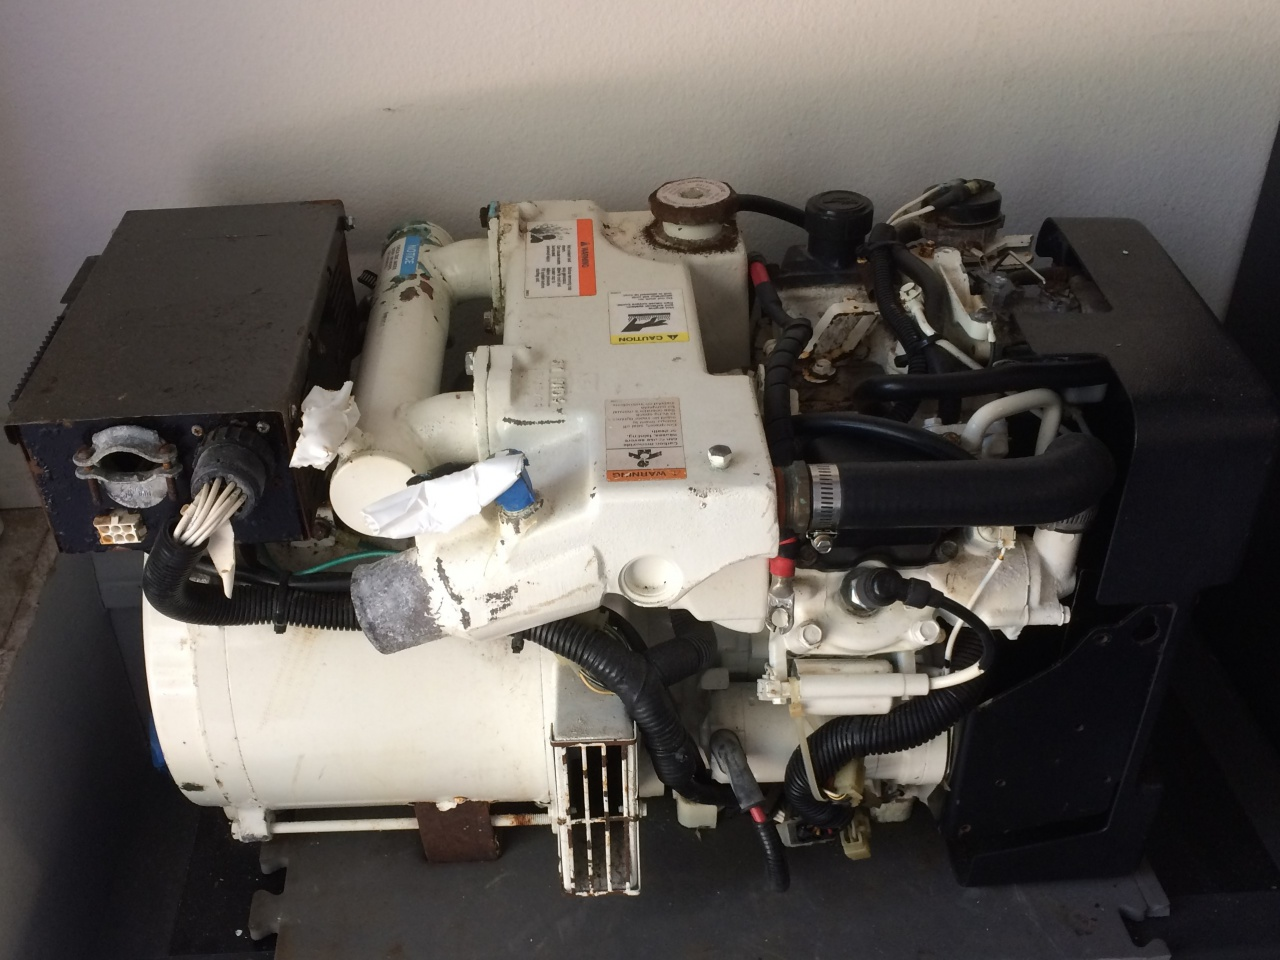 5E Generator kohler 5e-4kw gas generator: fix or parts - pensacola